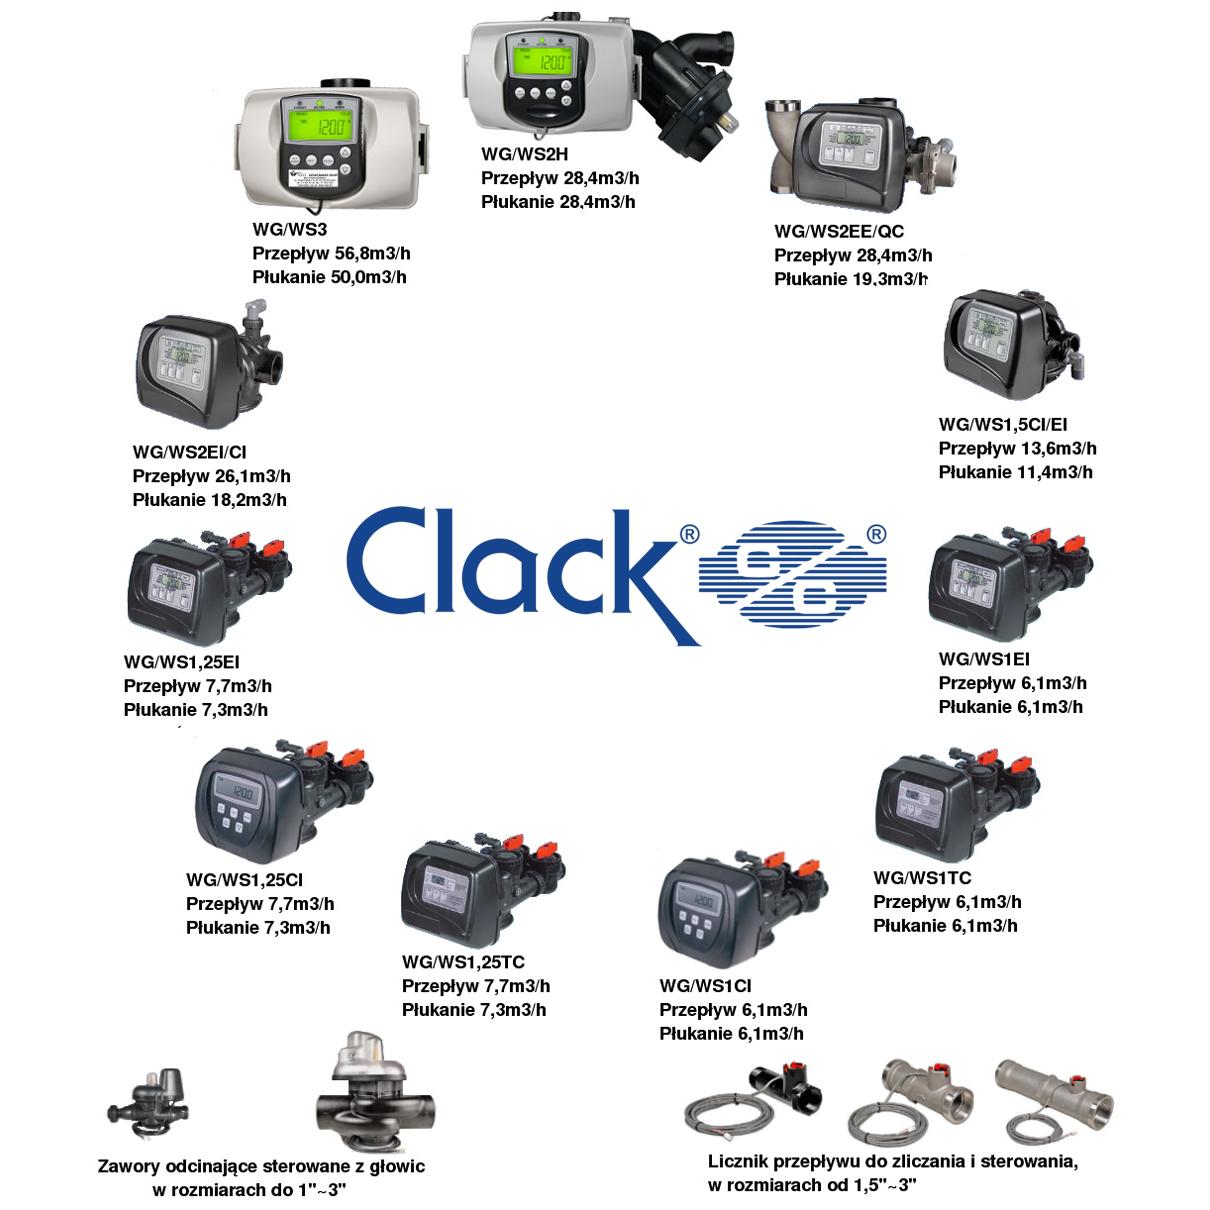 Клапаны Clack ассортимент